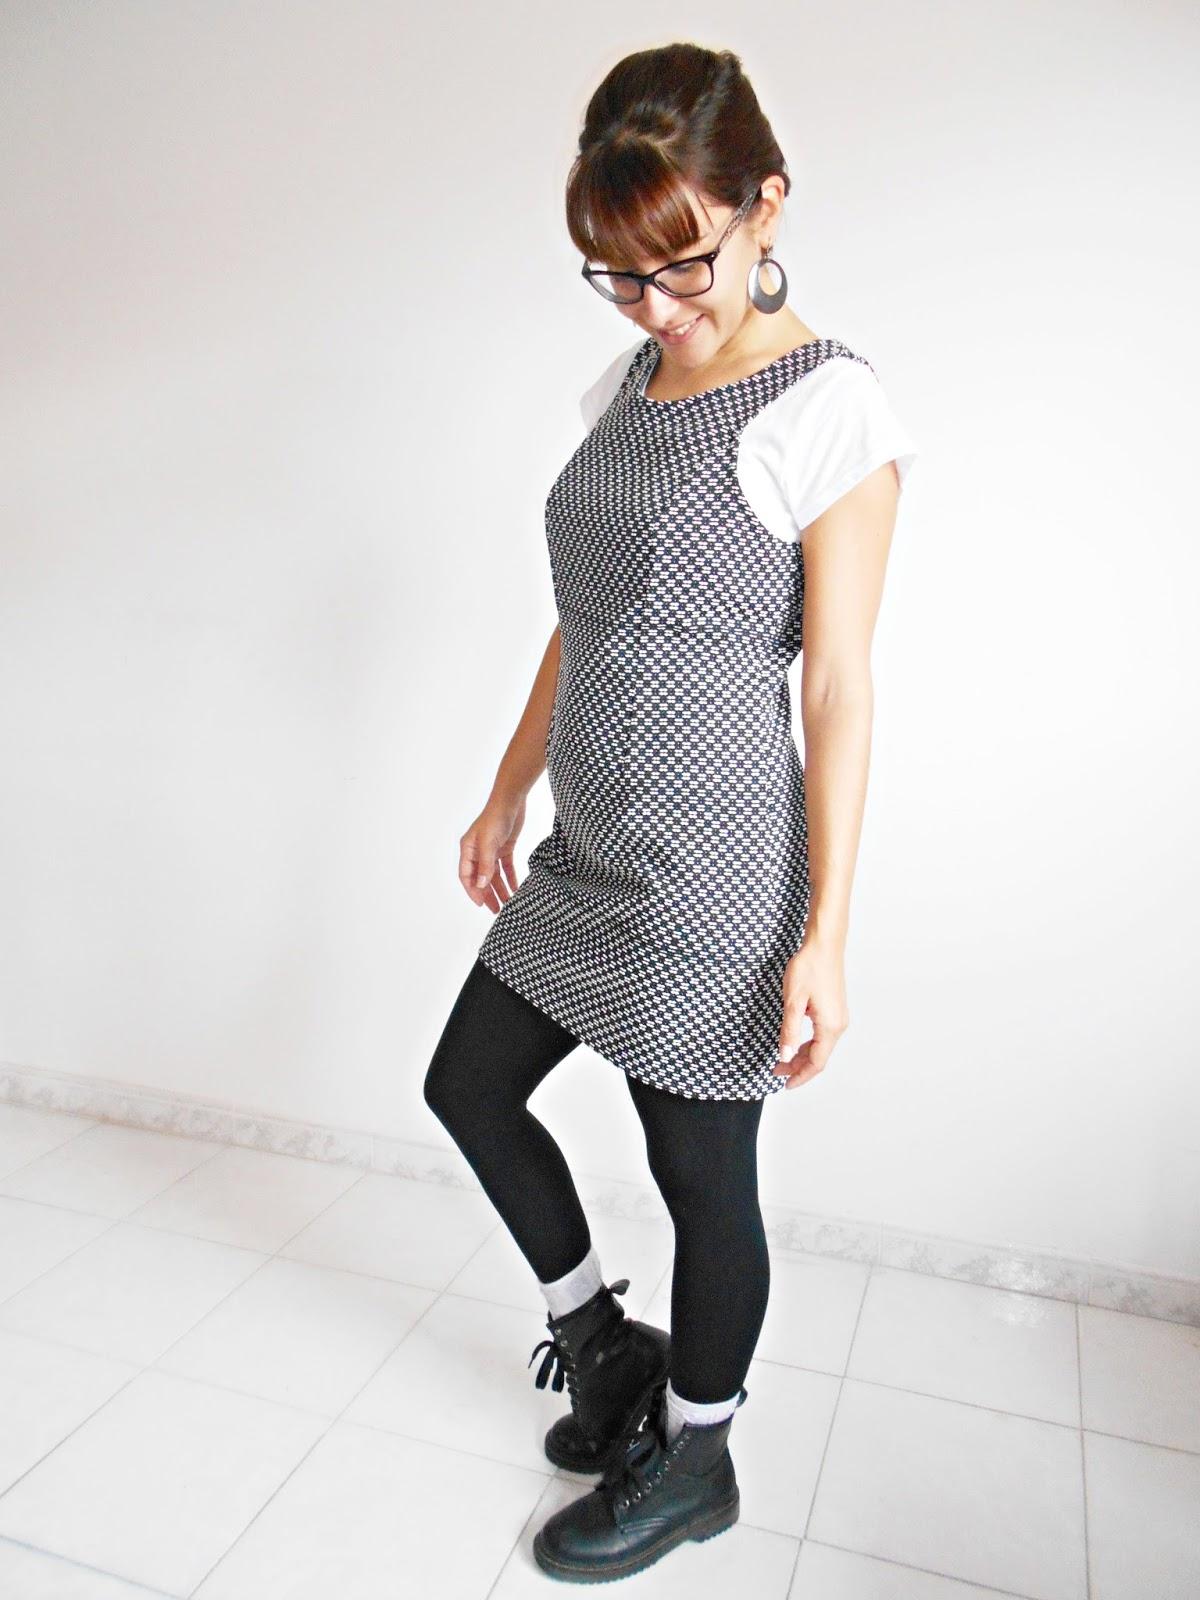 #retoqueprendasnecesito: Vestido formal